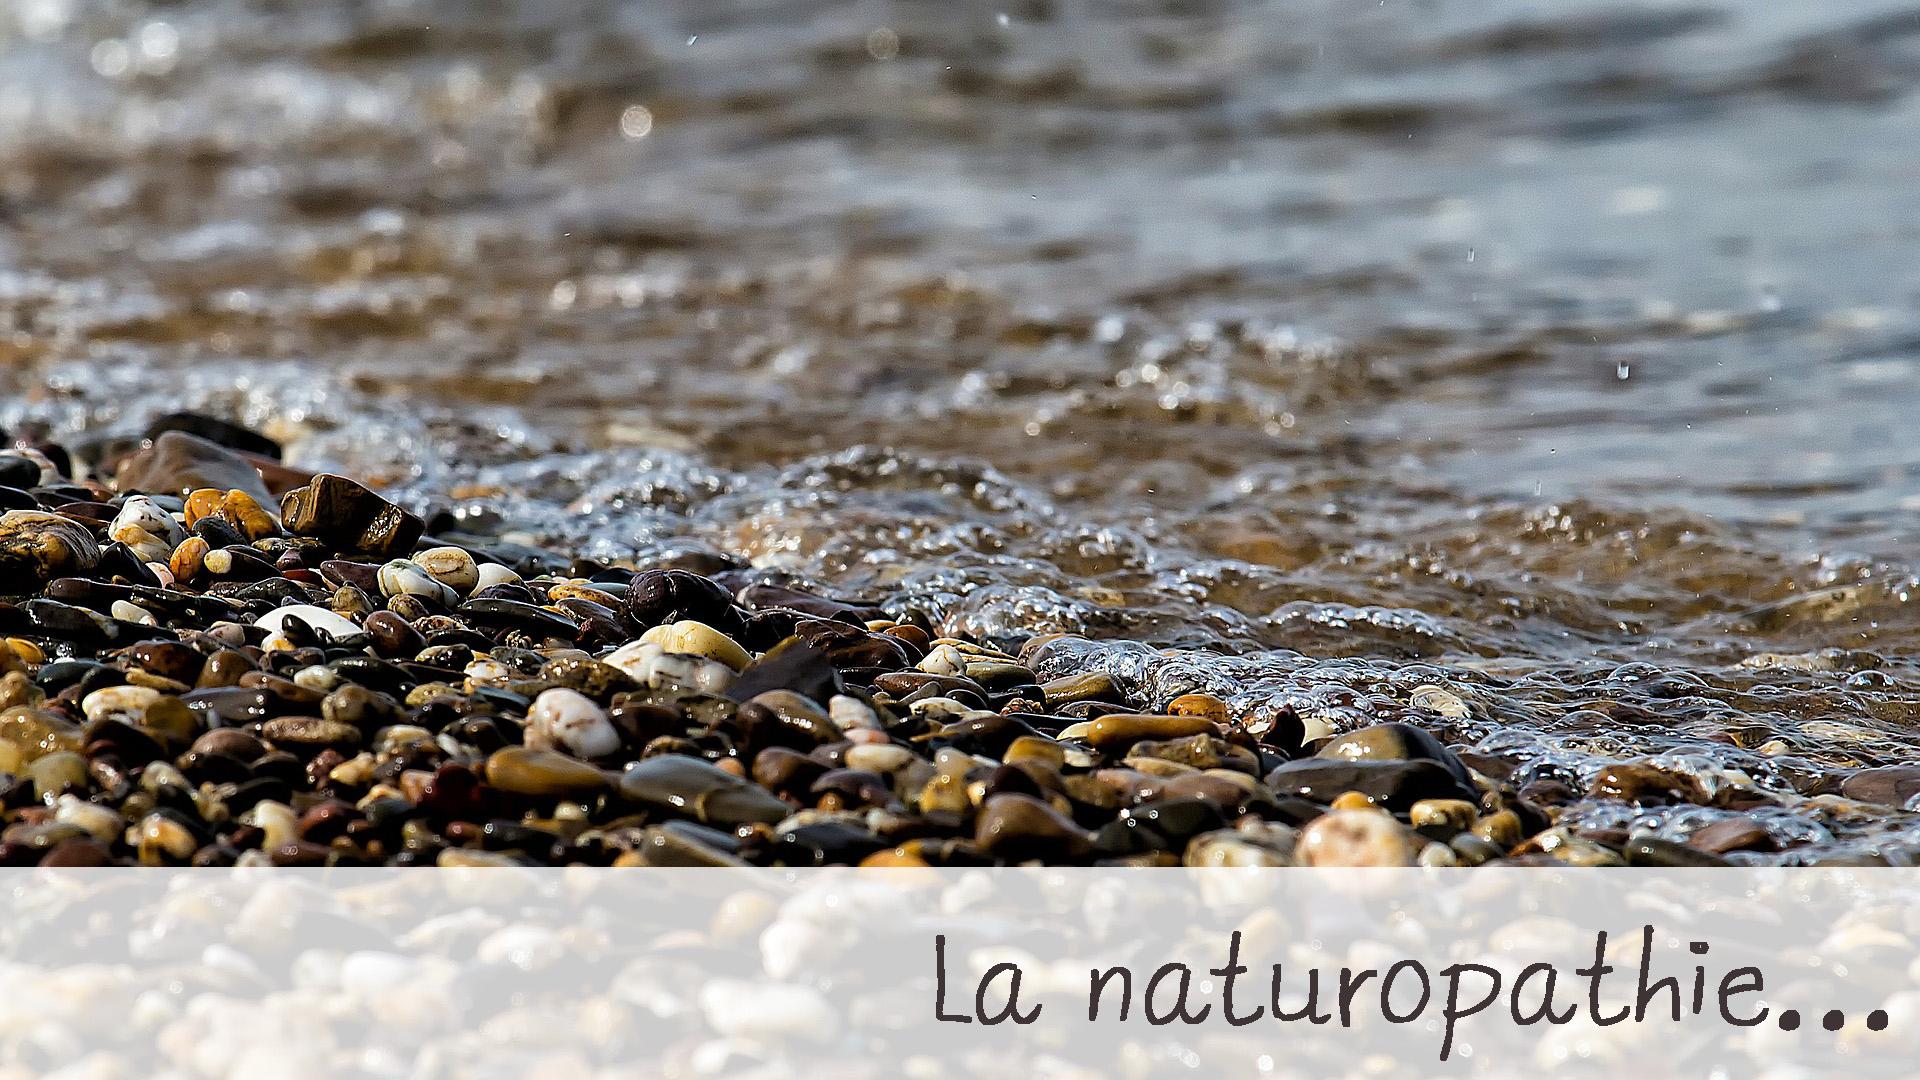 (c) Caroline-pannetier-naturopathe.fr